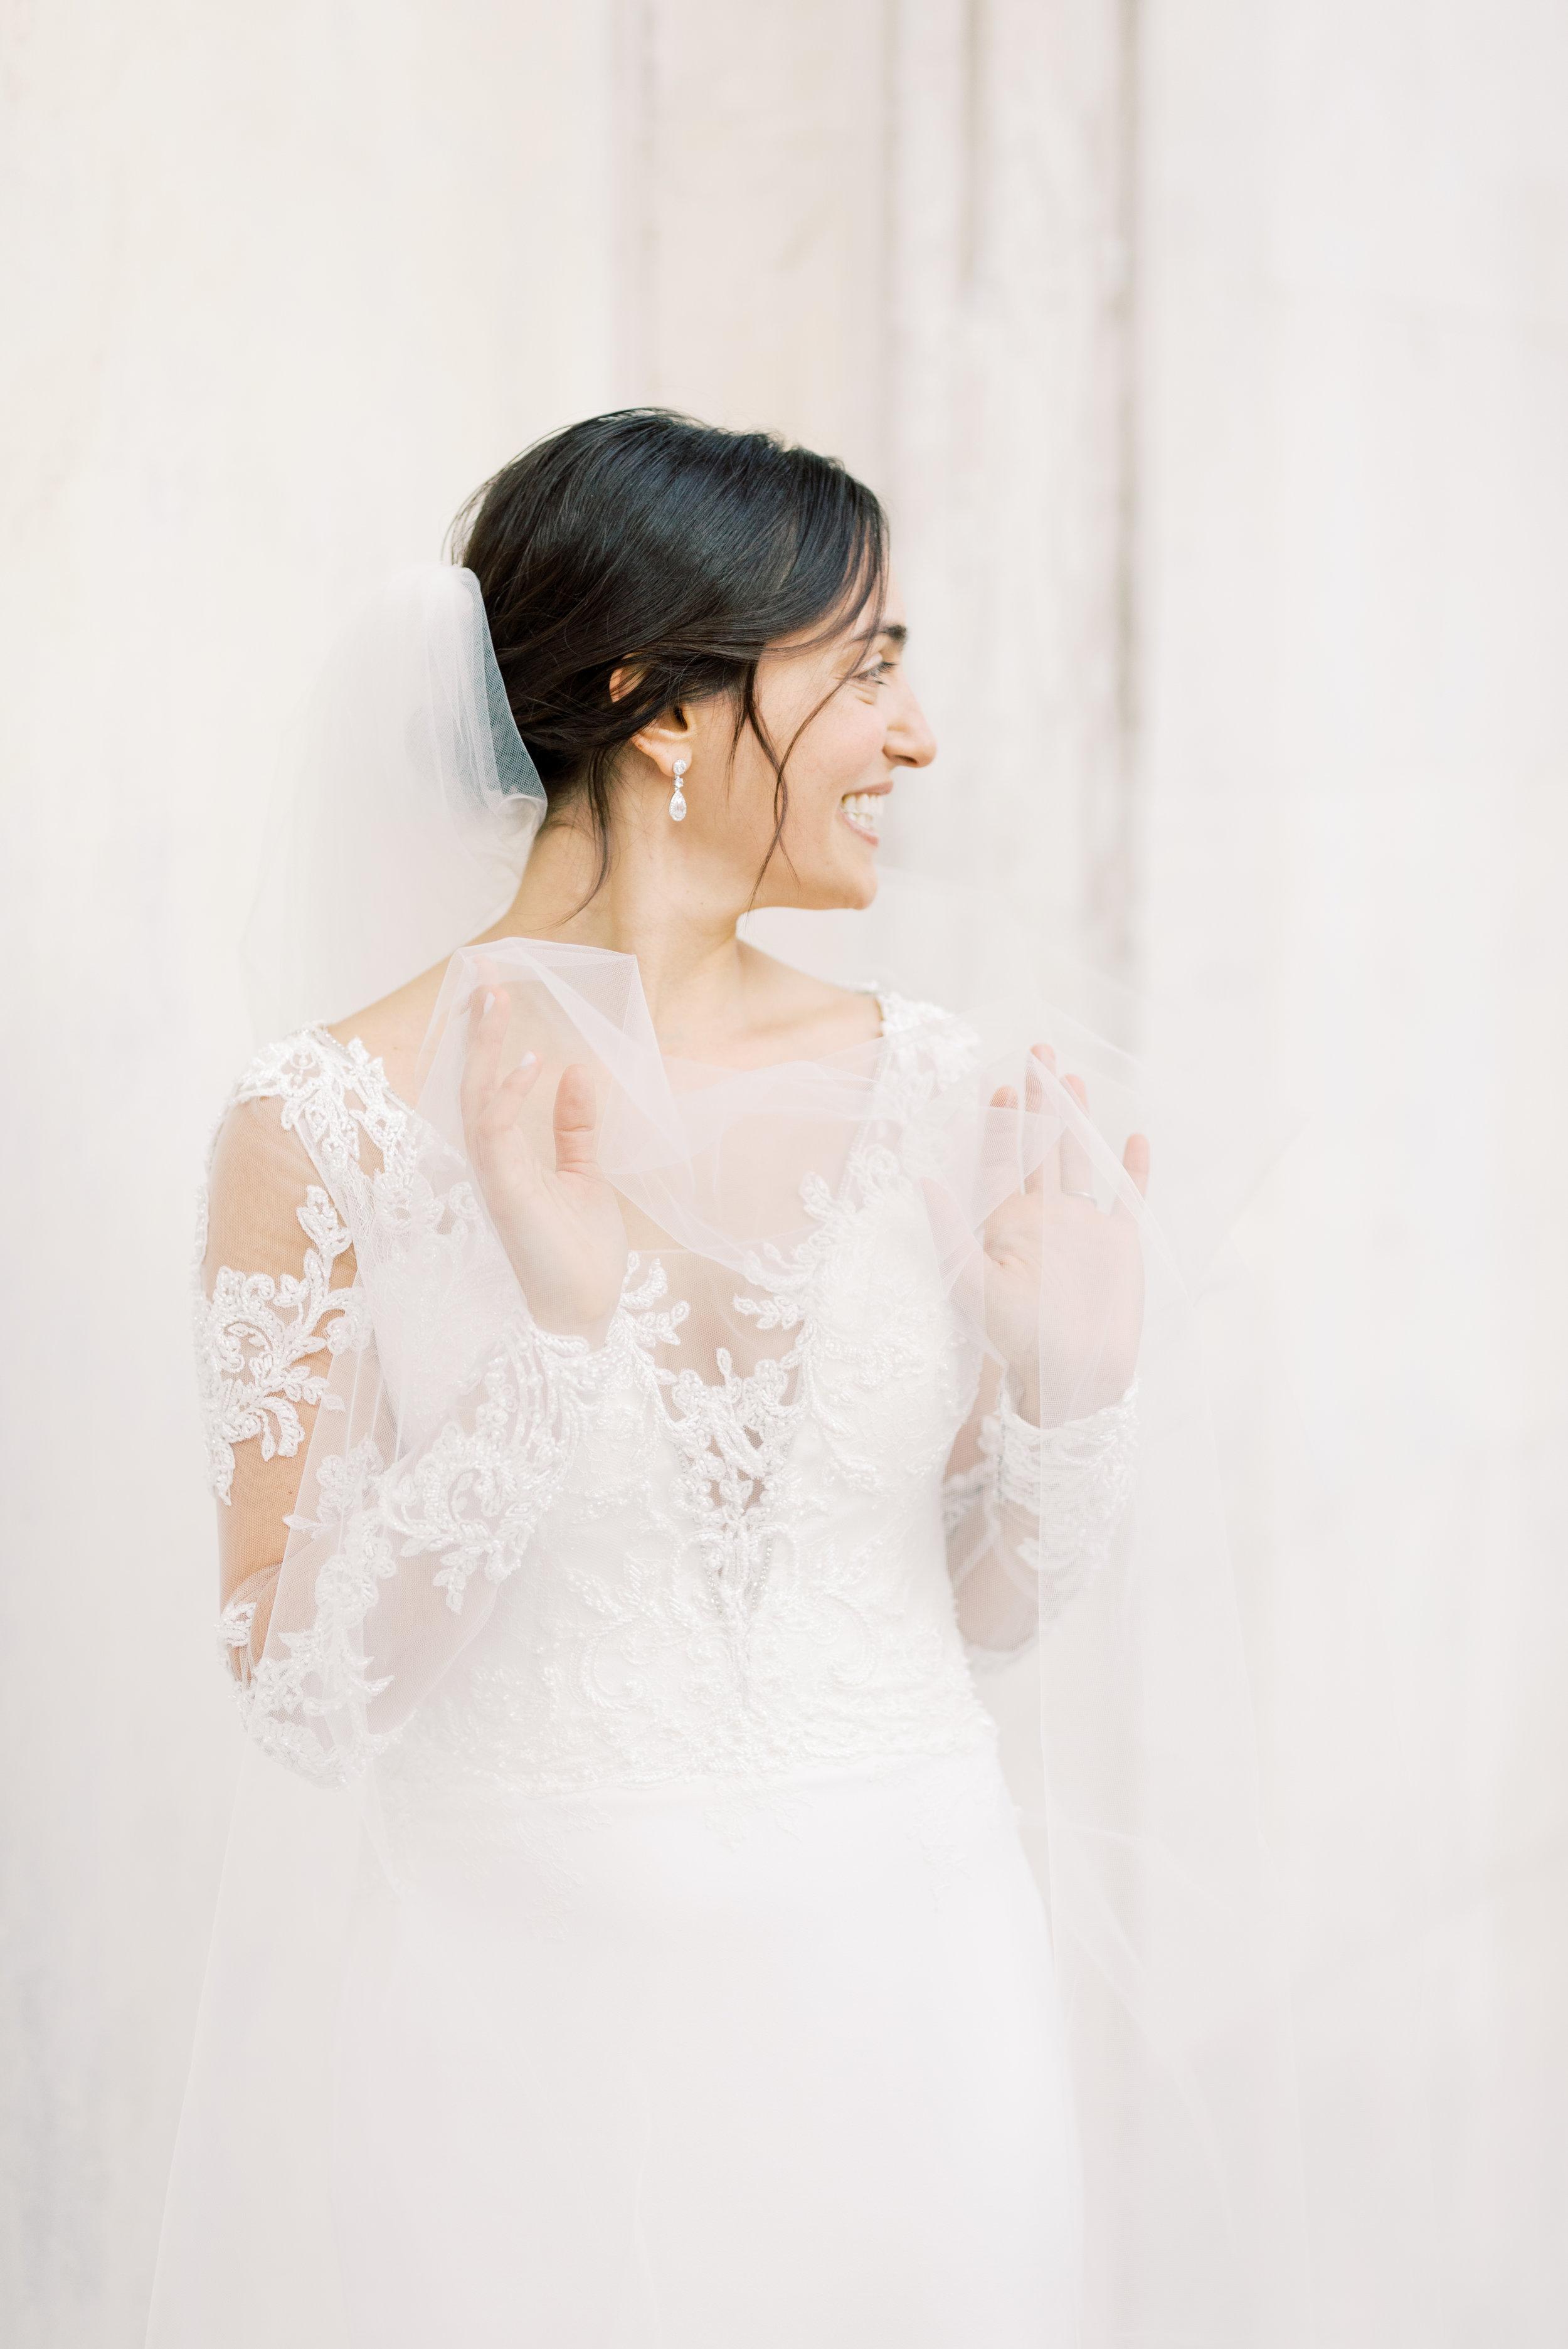 haley-richter-photography-classic-winter-union-trust-philadelphia-wedding-041.jpg